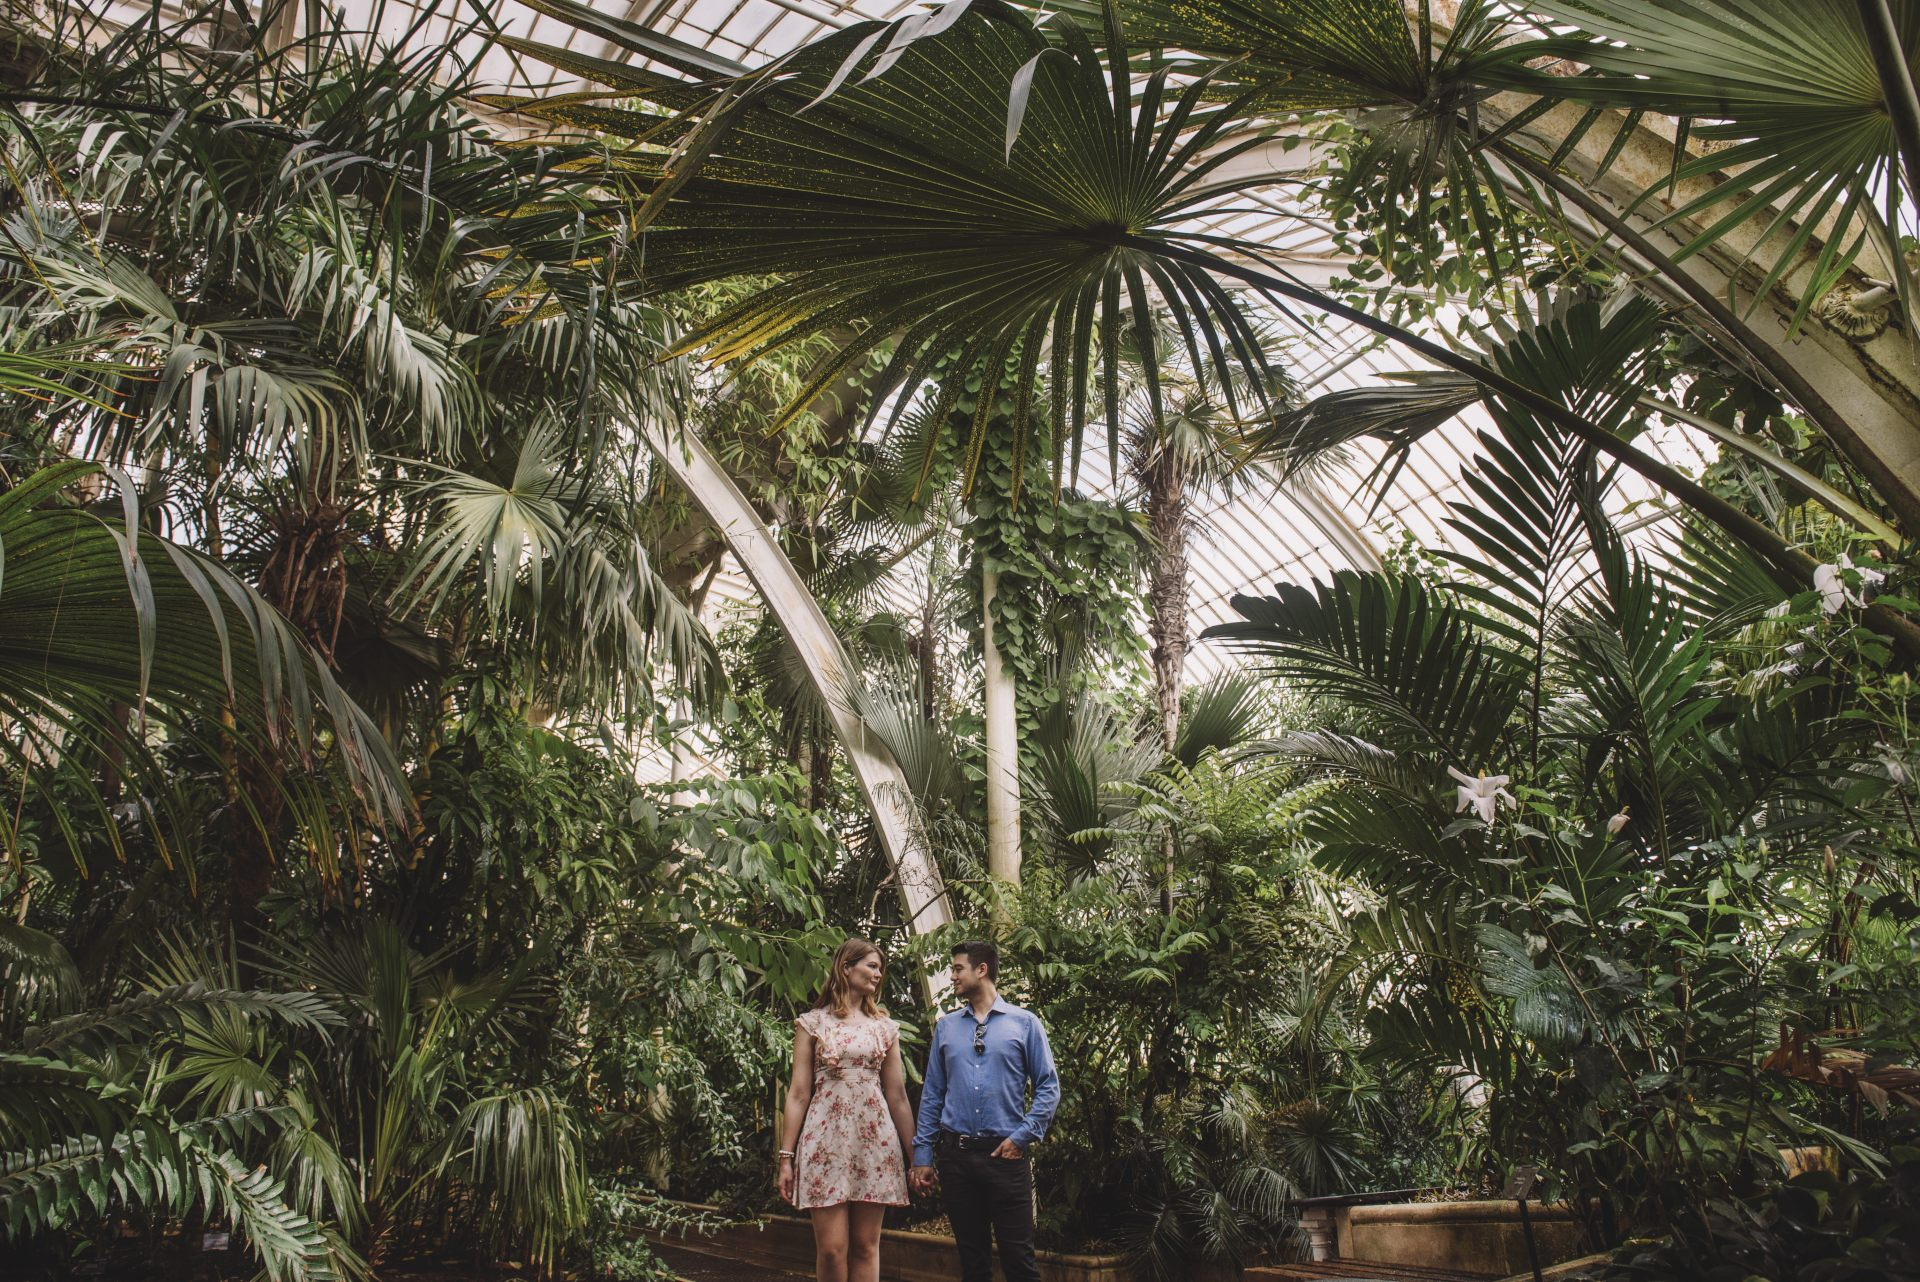 Sarah and Jon Kew Gardens Engagement | Emma Jane Photography